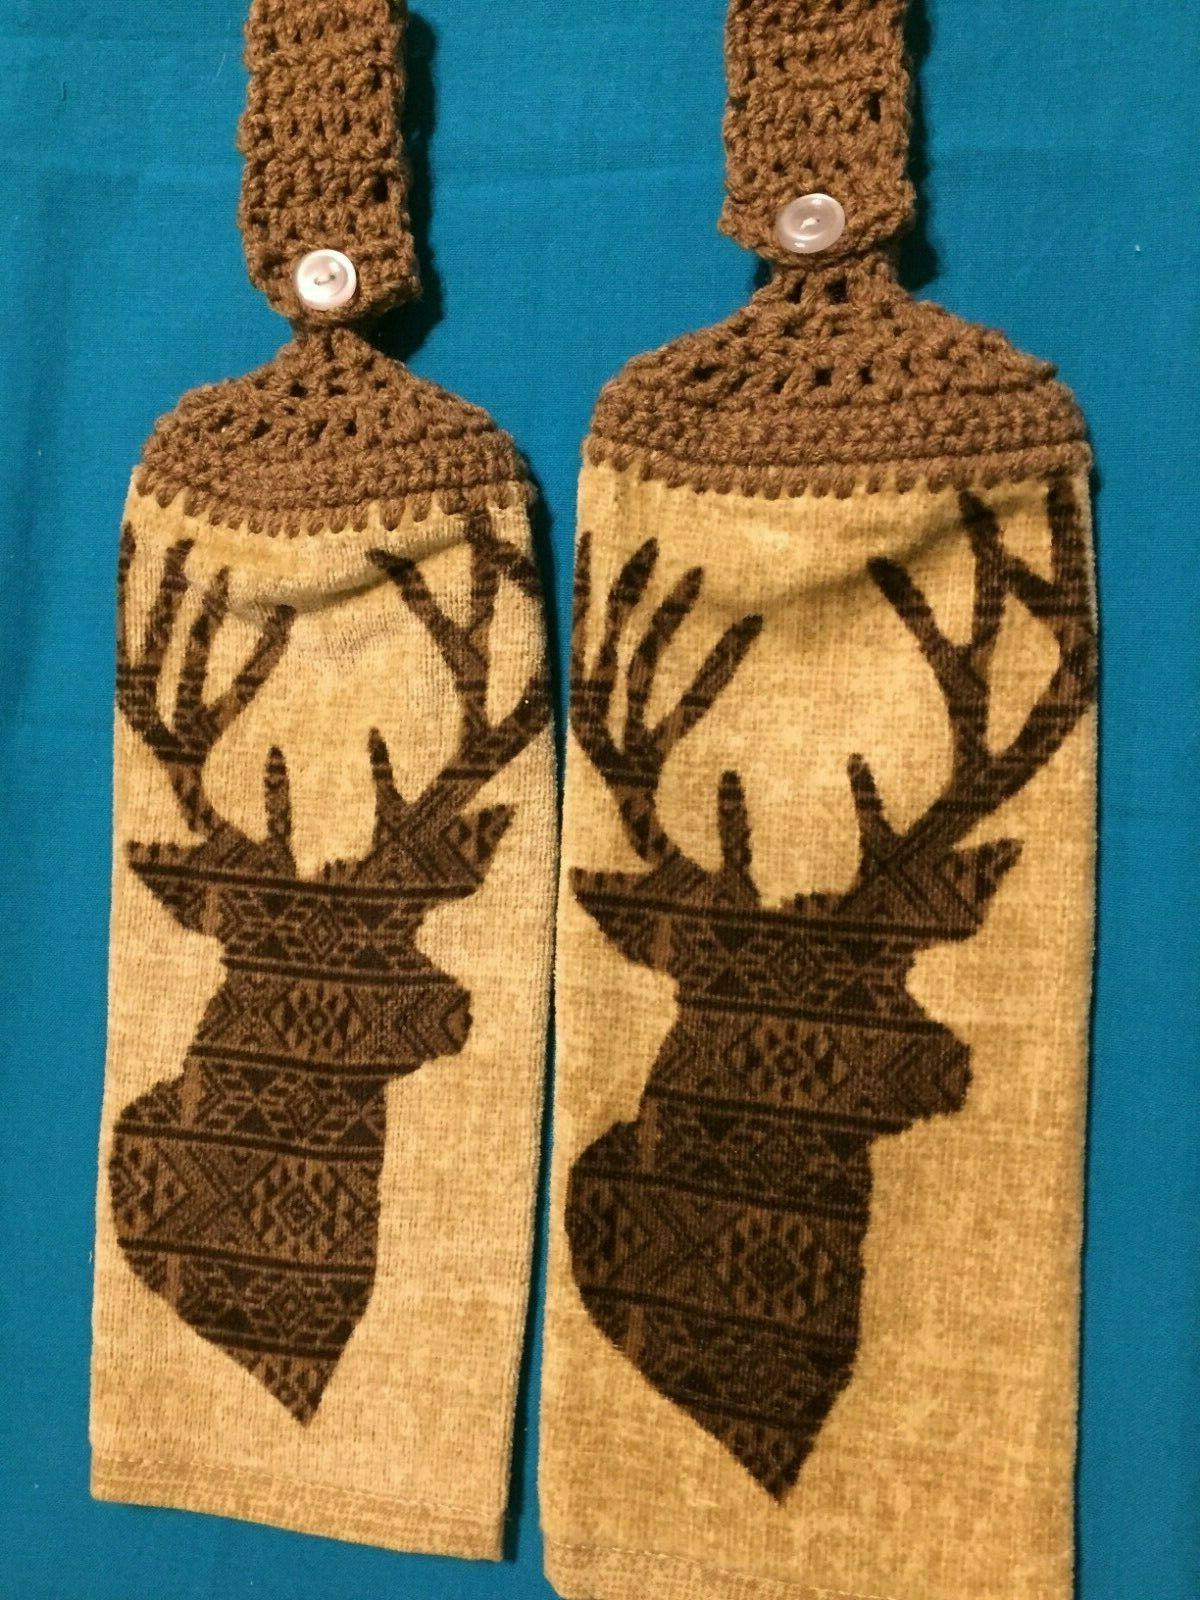 2 hanging kitchen dish towels crocheted deer